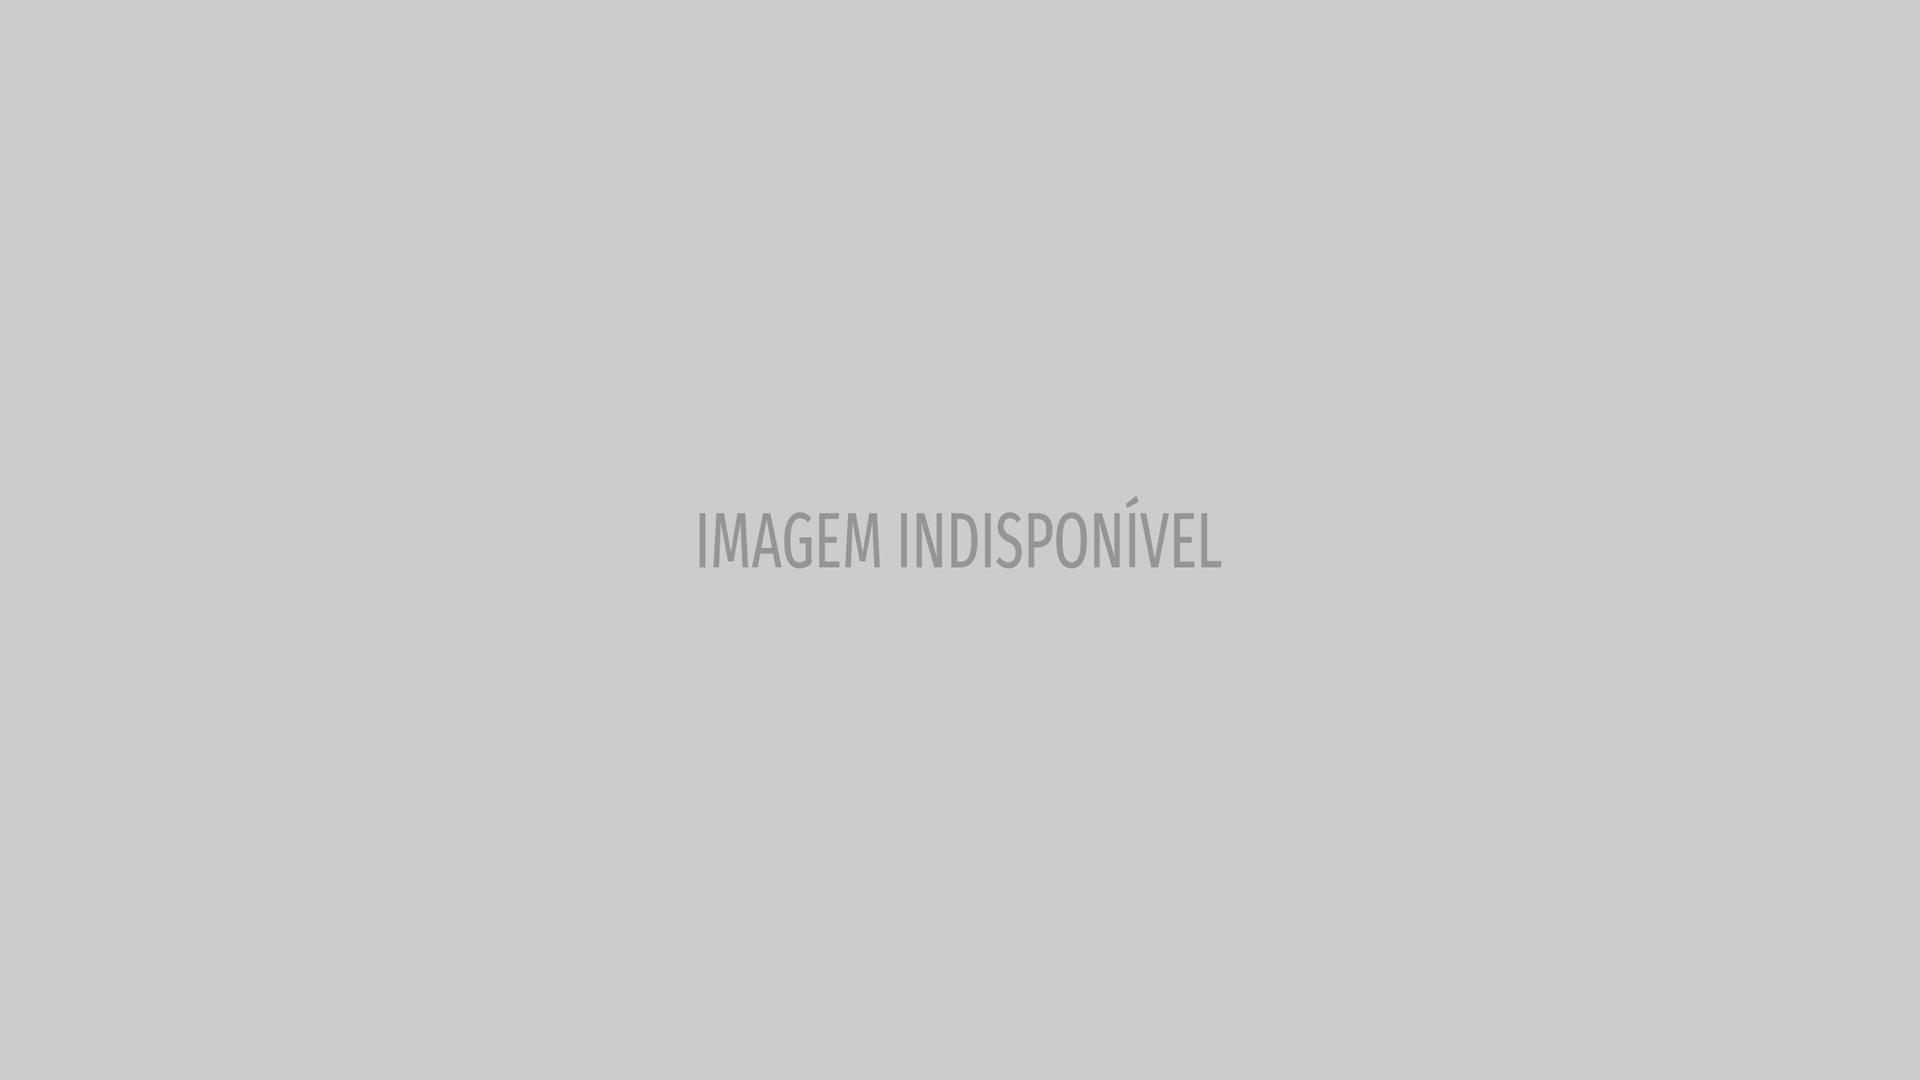 Que amor! Vídeo mostra filha de Kylie Jenner a cantar os parabéns à mamã